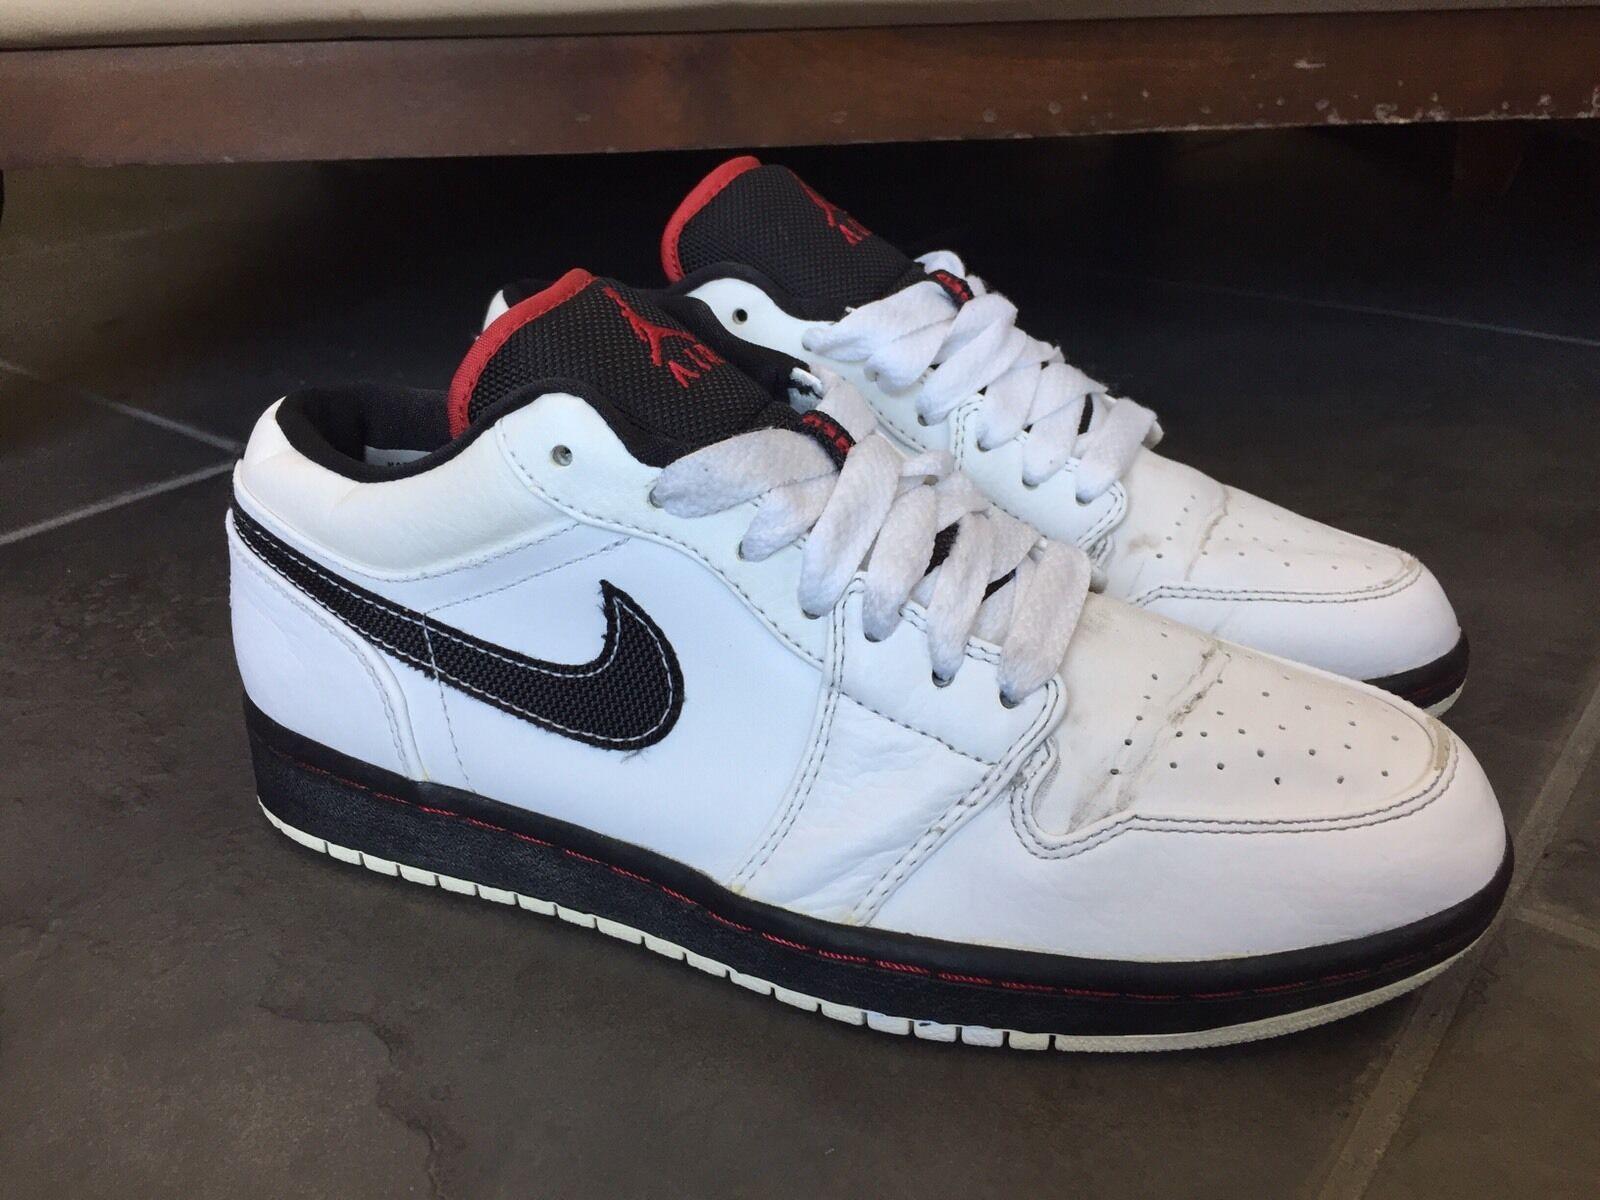 2008 Nike Air Jordan I Retro 1 PHAT LOW White Varsity Red Black 338145-061 Sz 8